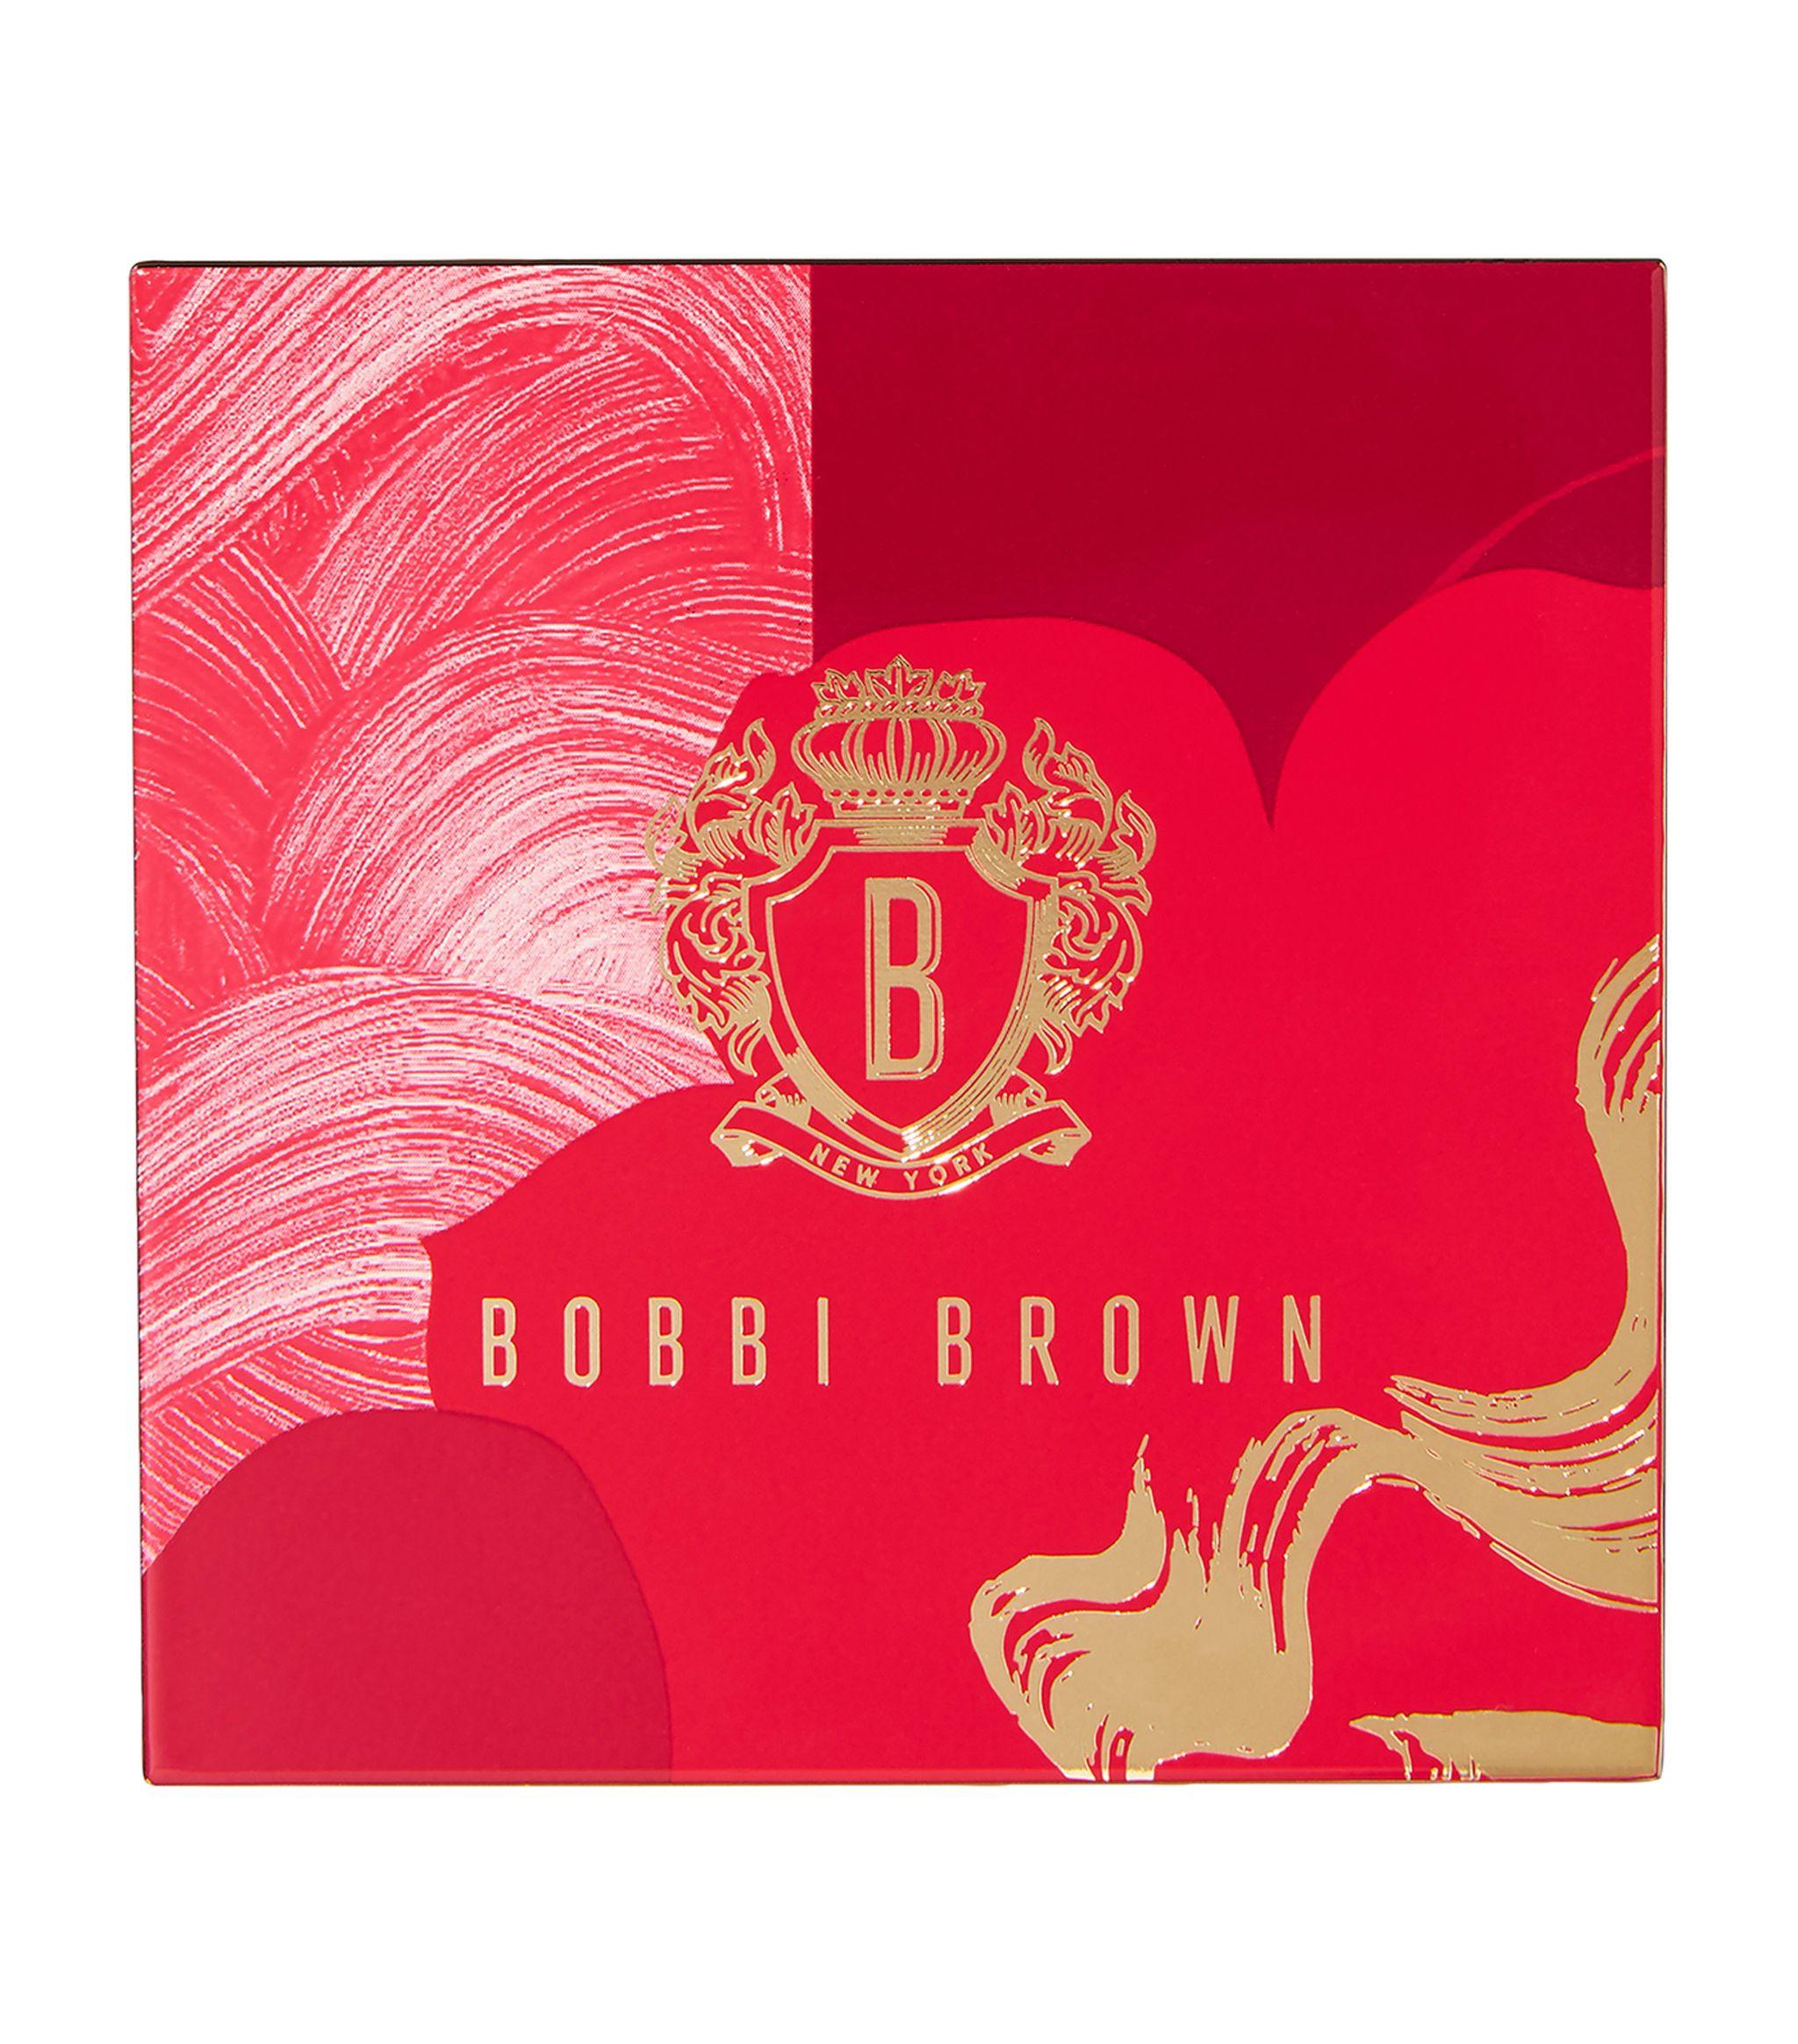 Bobbi Brown Stroke of Luck Highlighting Powder